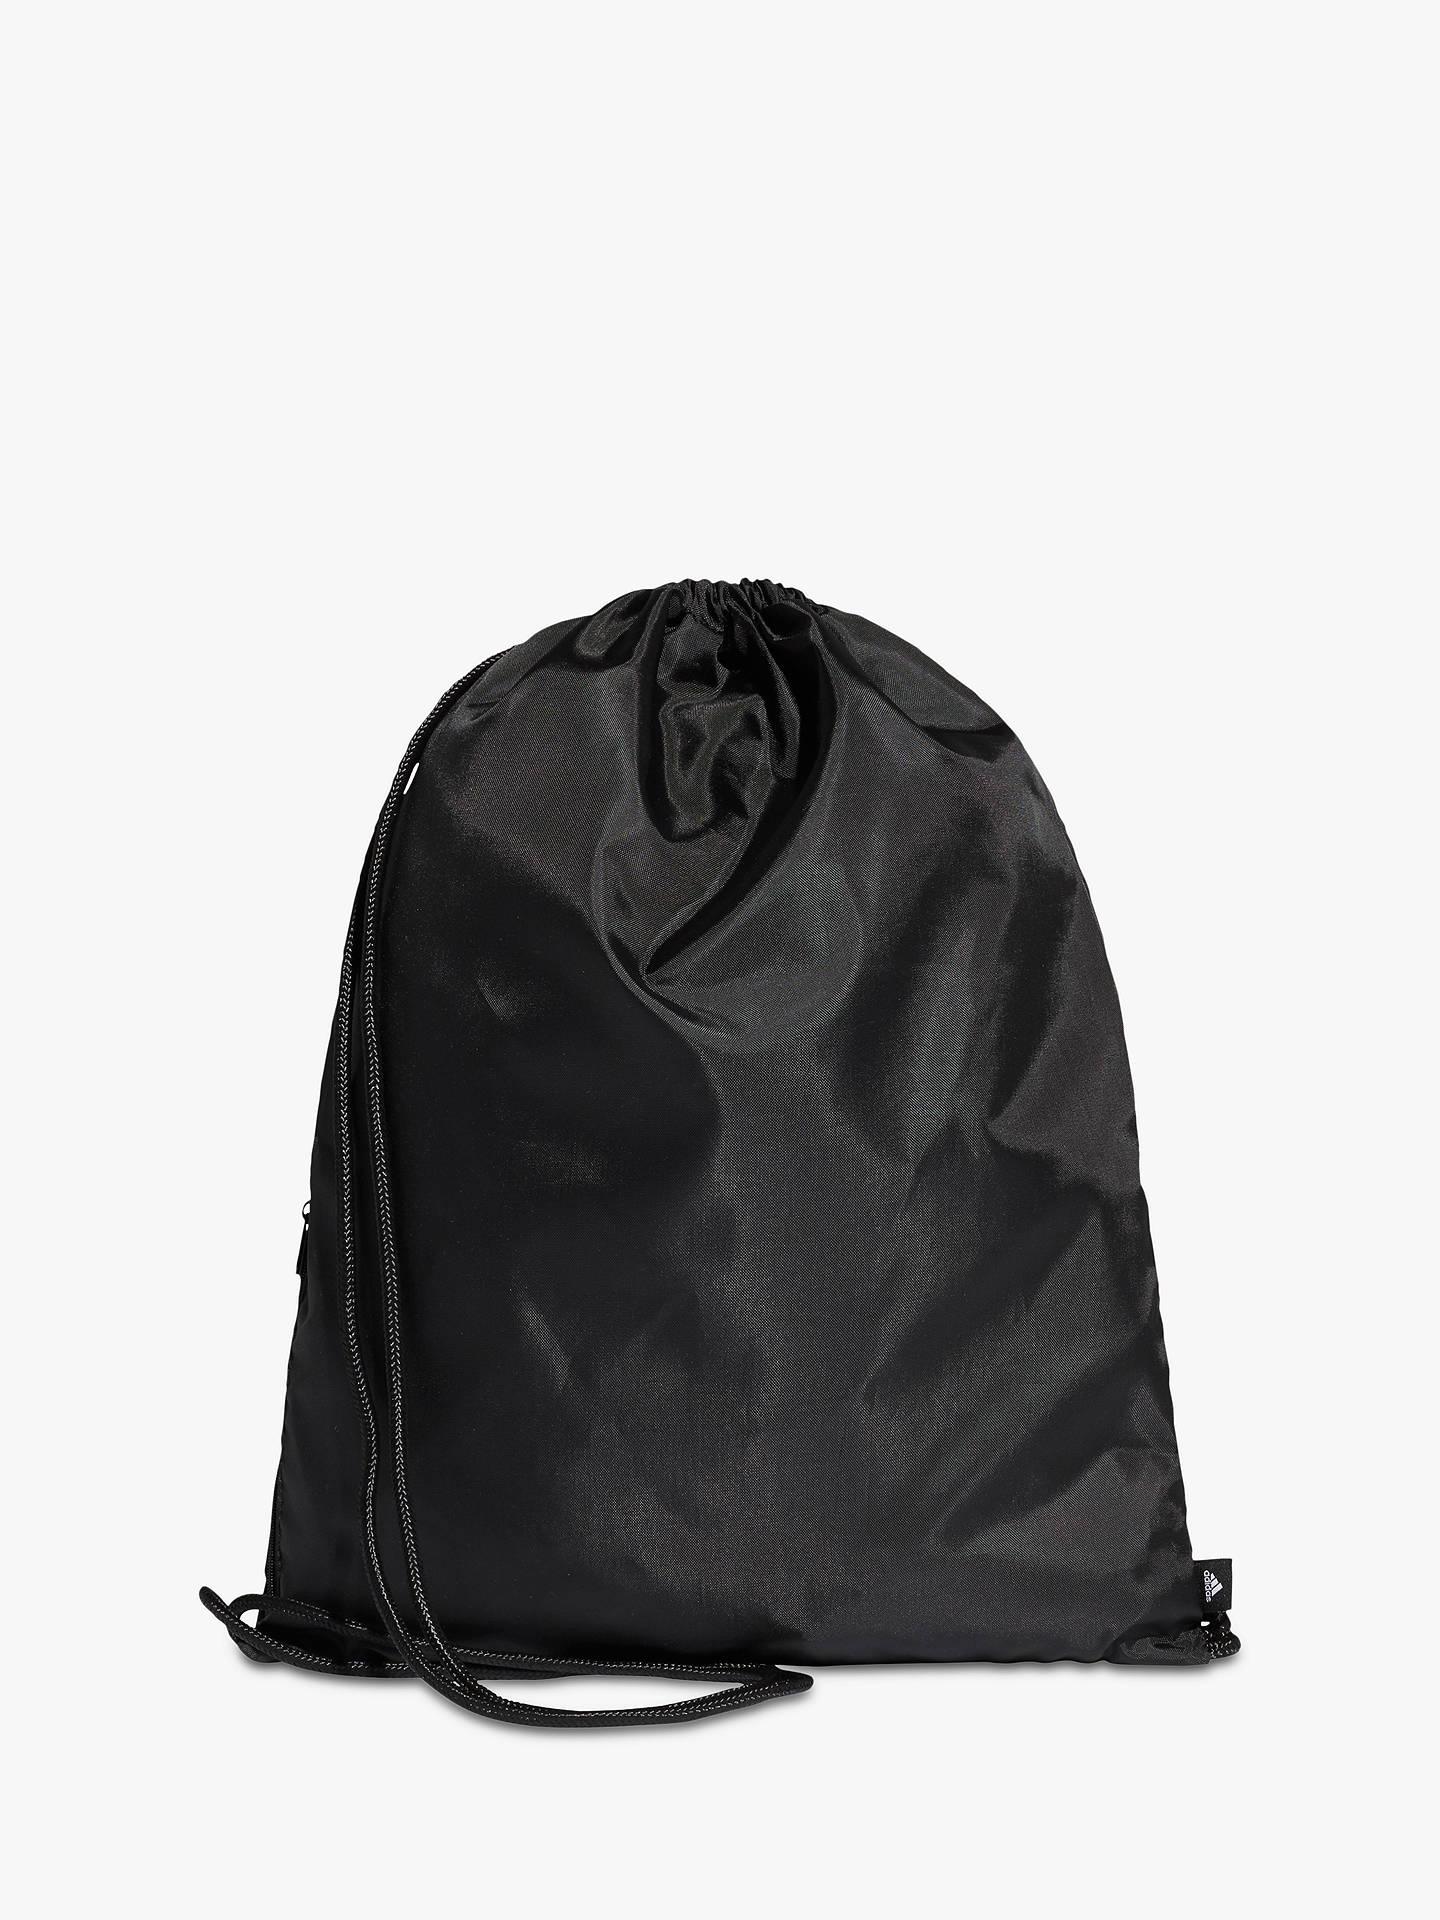 Adidas Performance Logo Drawstring Bag Black White